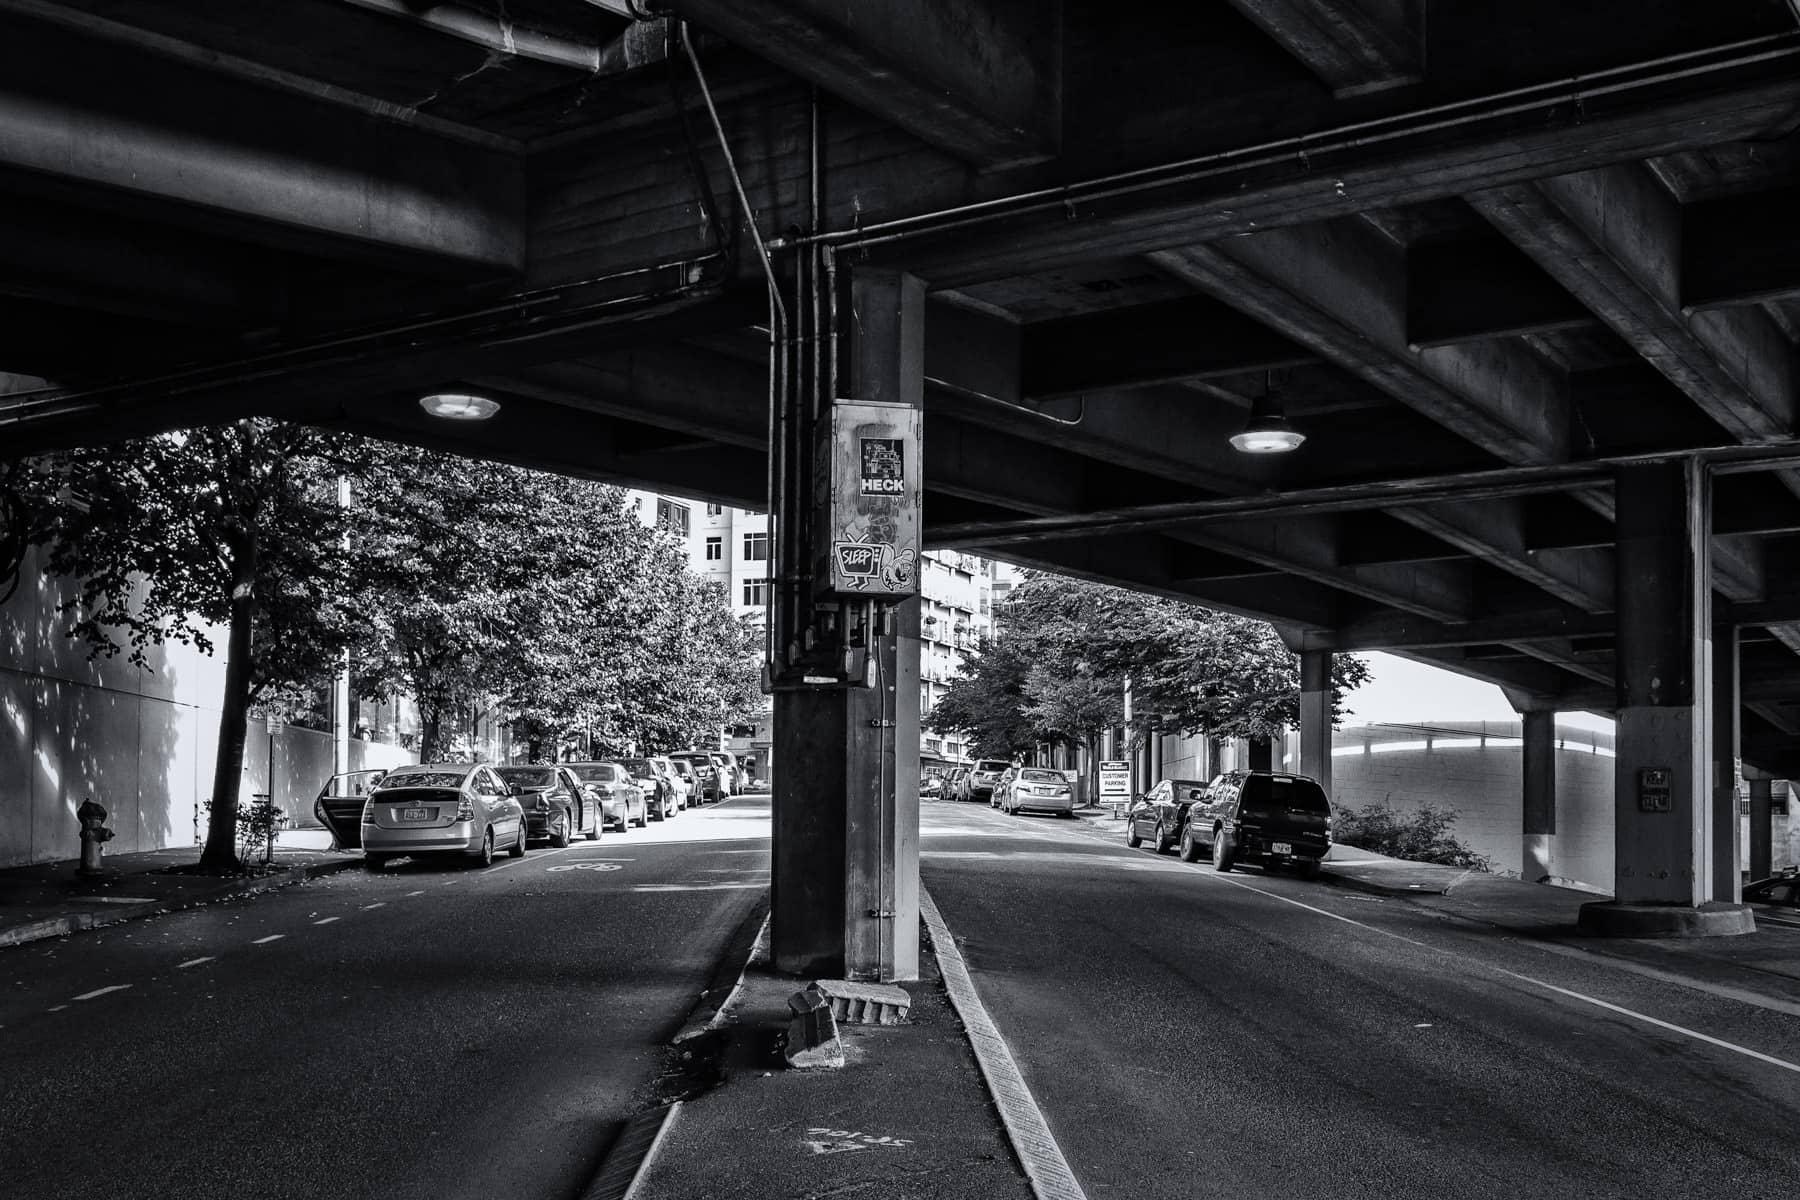 Seattle's Blanchard Street passes under the Alaskan Way Viaduct in the city's Belltown neighborhood.